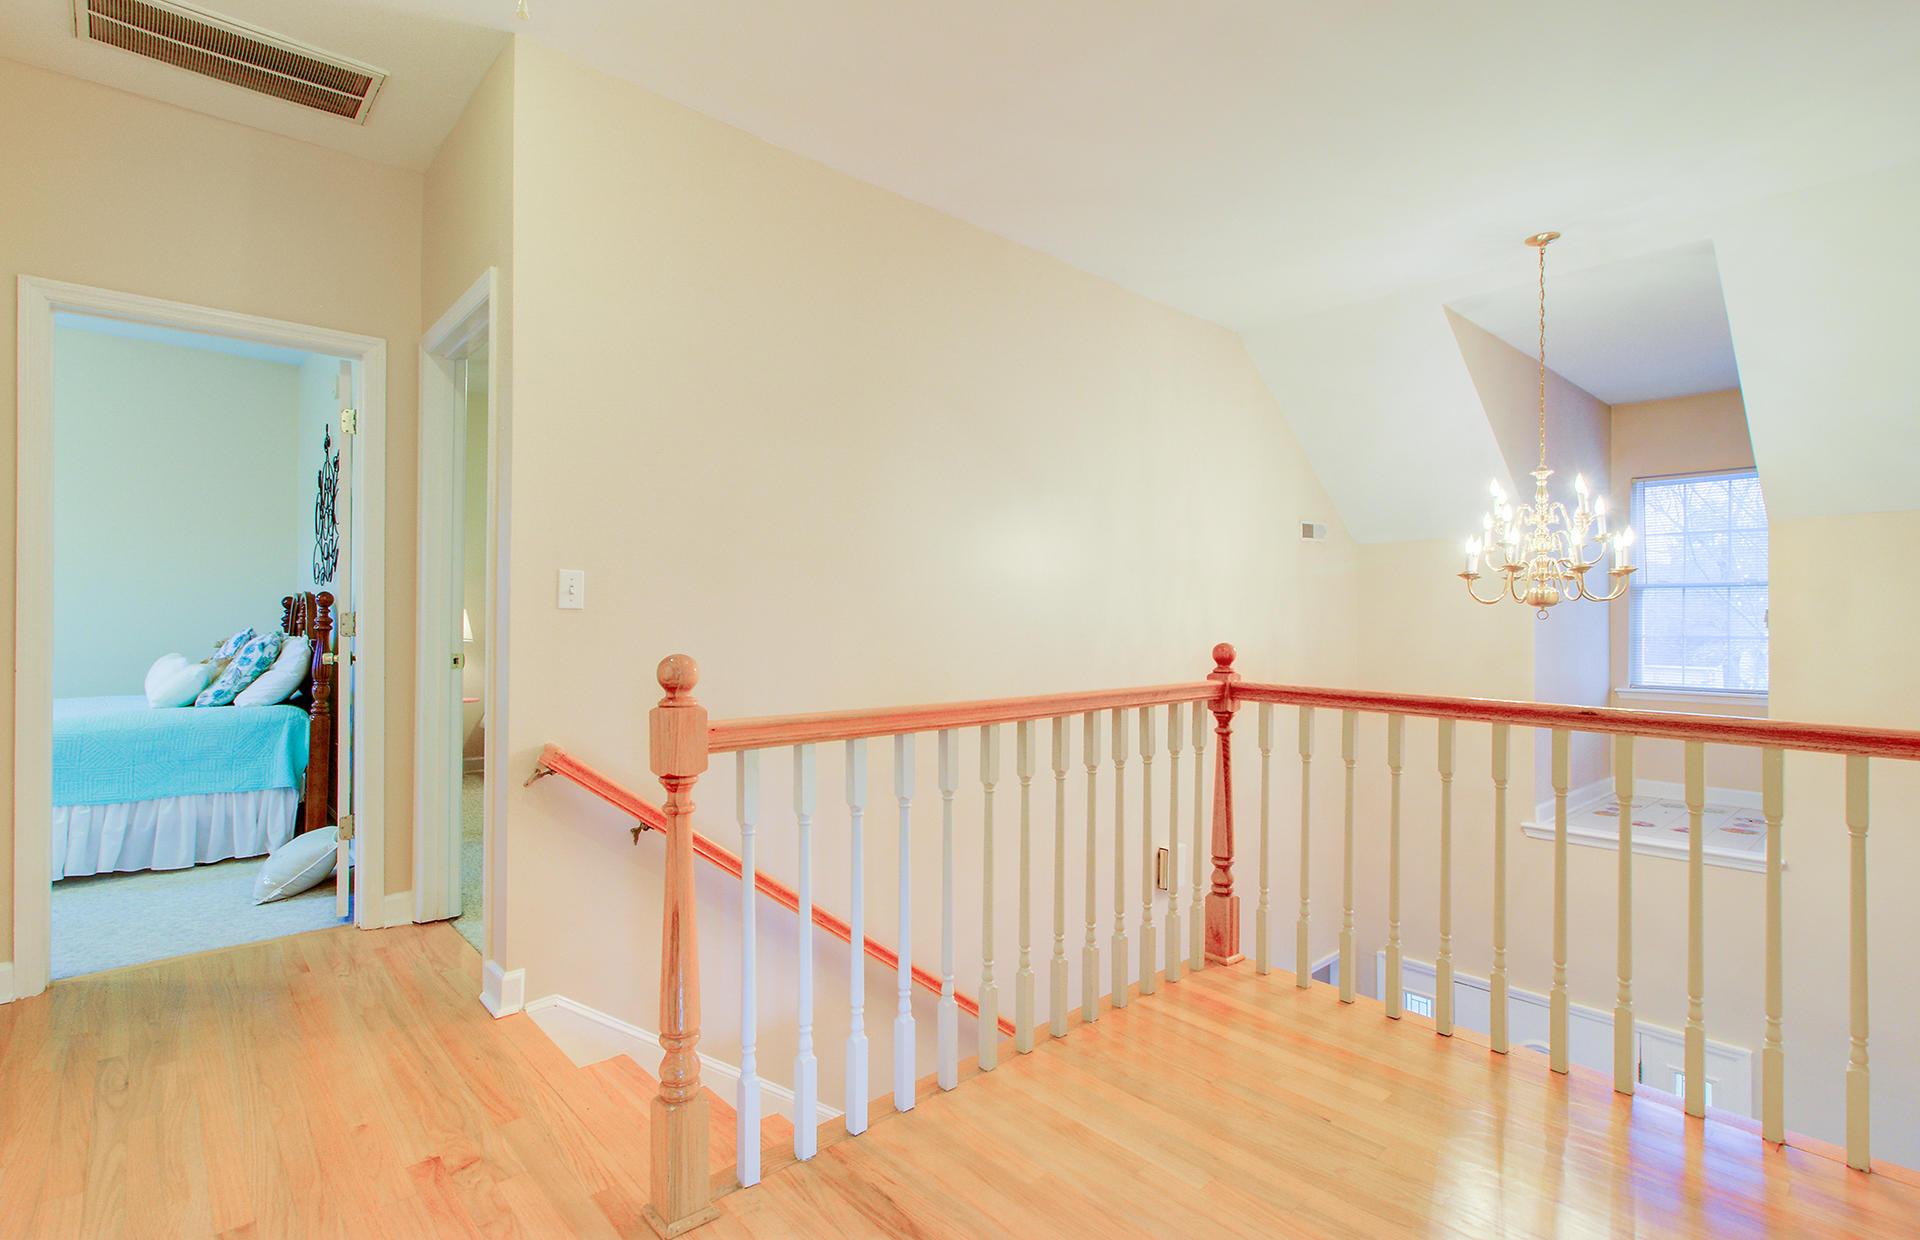 Bakers Landing Homes For Sale - 105 River Oak, North Charleston, SC - 9